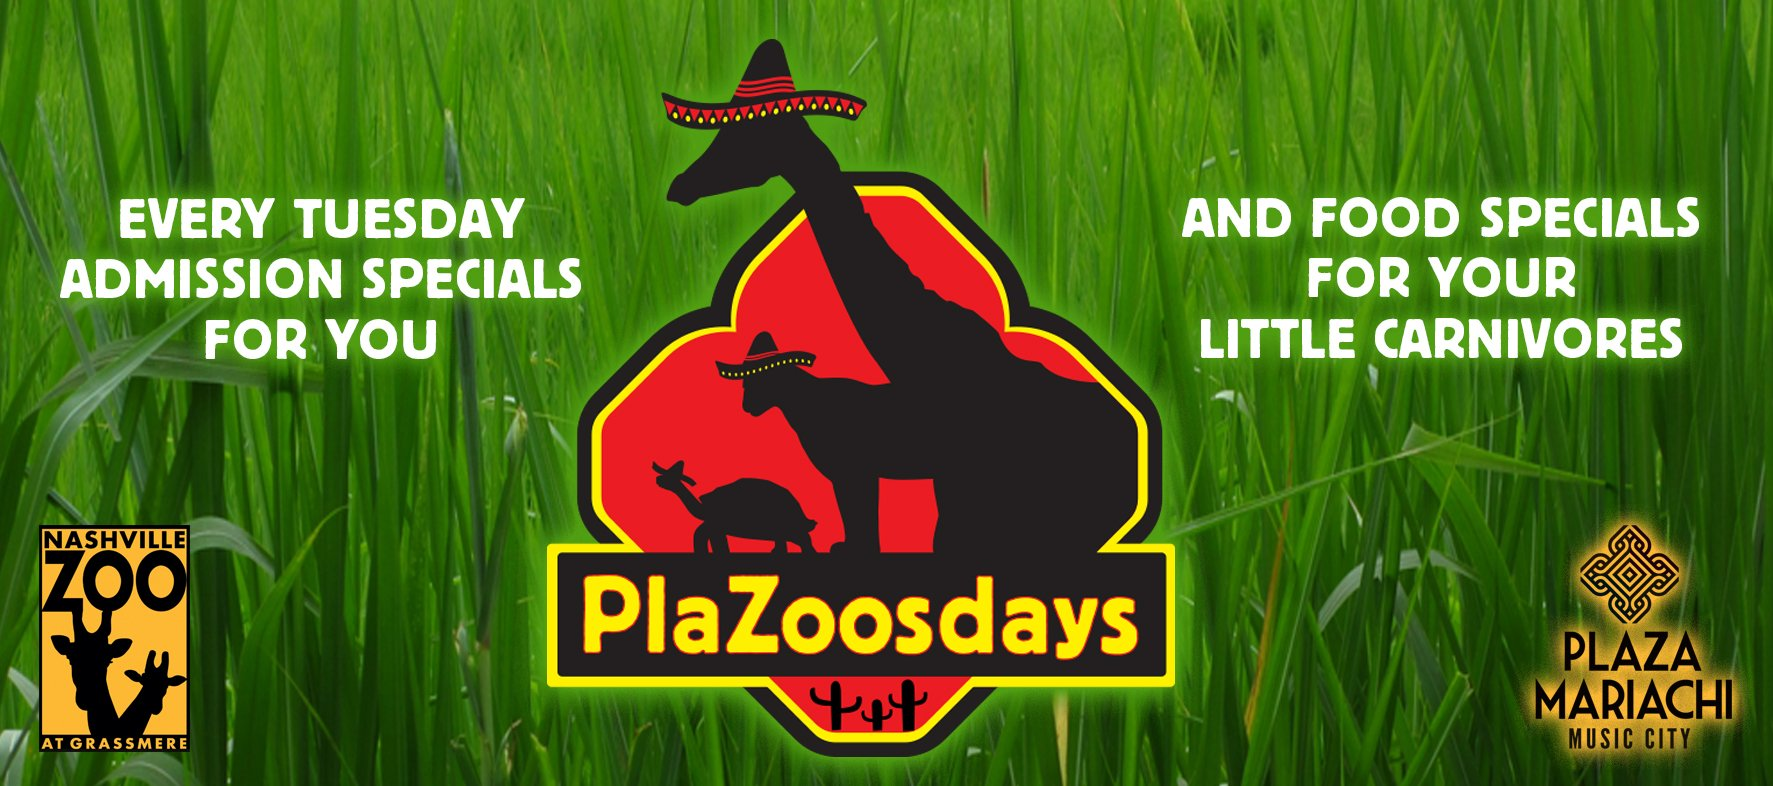 Plazoosdays Specials